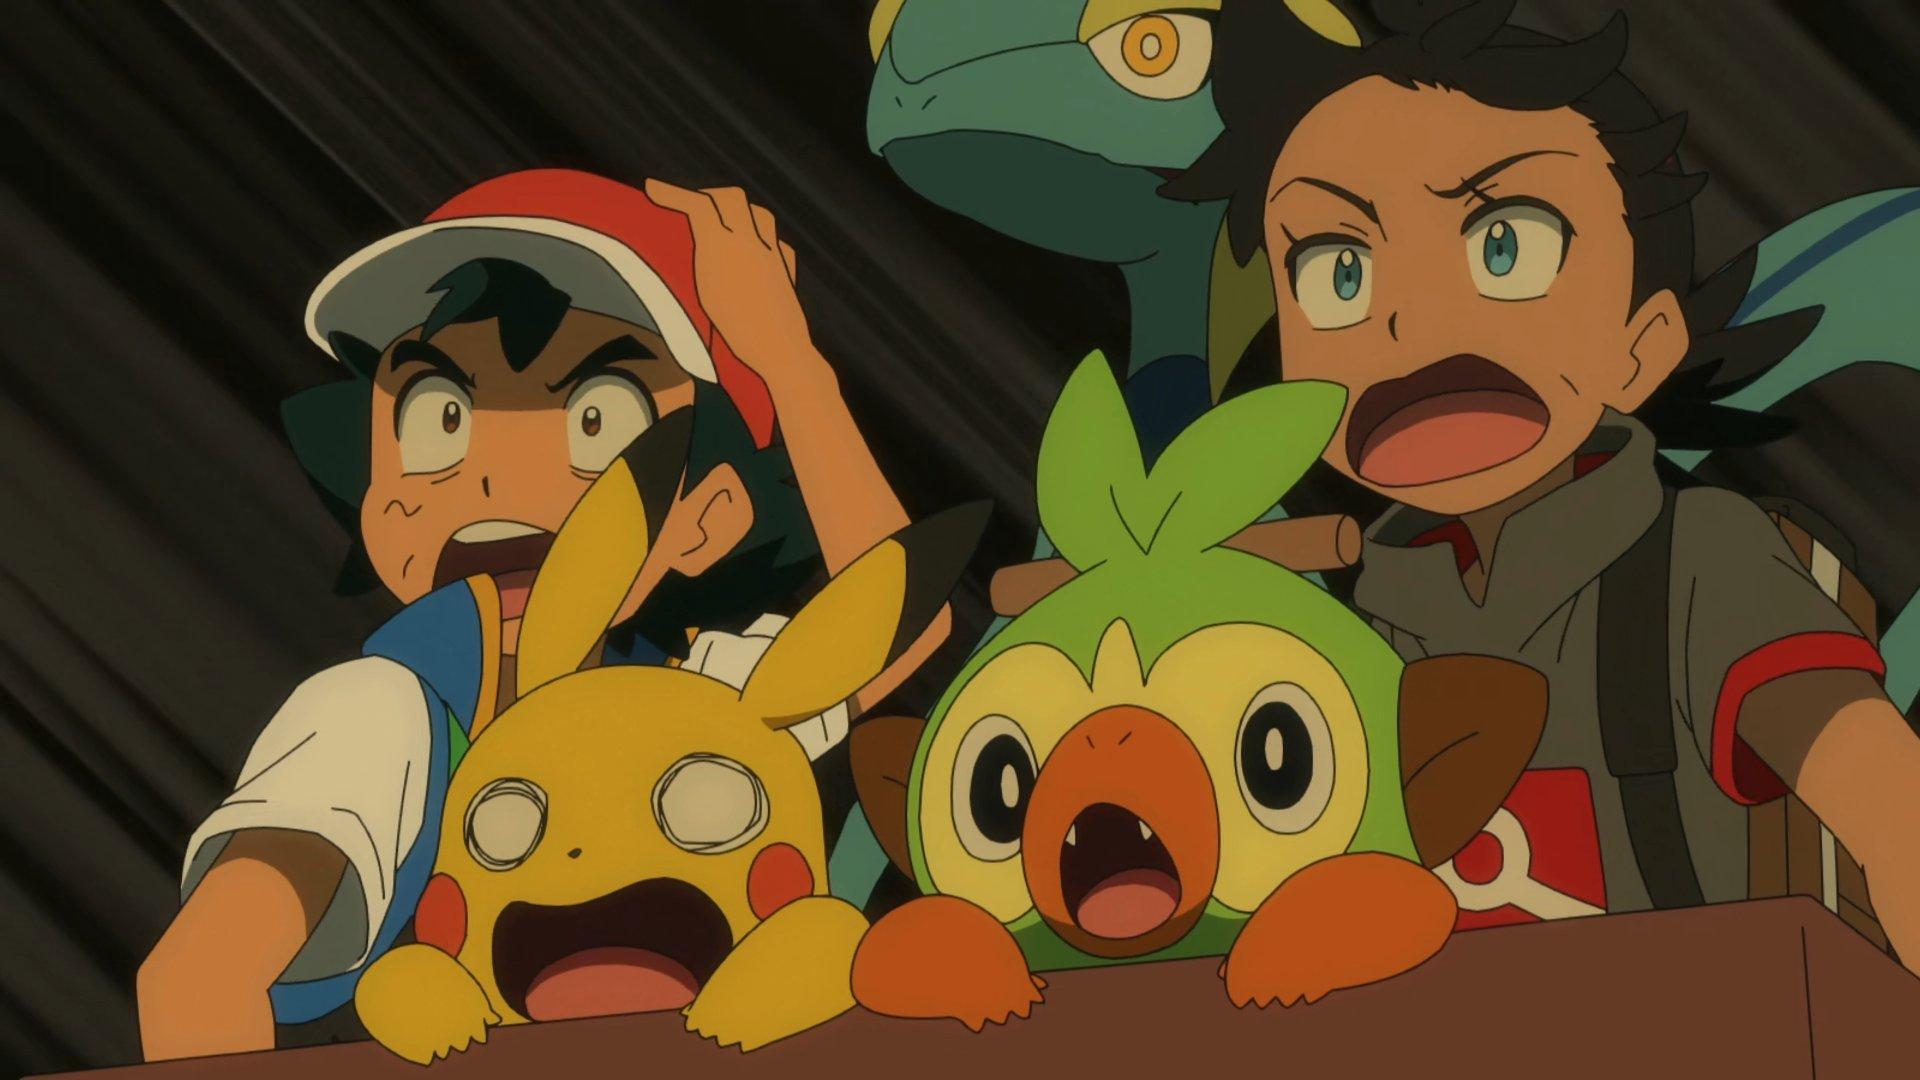 Capítulo Episodio 79 Pokémon Viajes